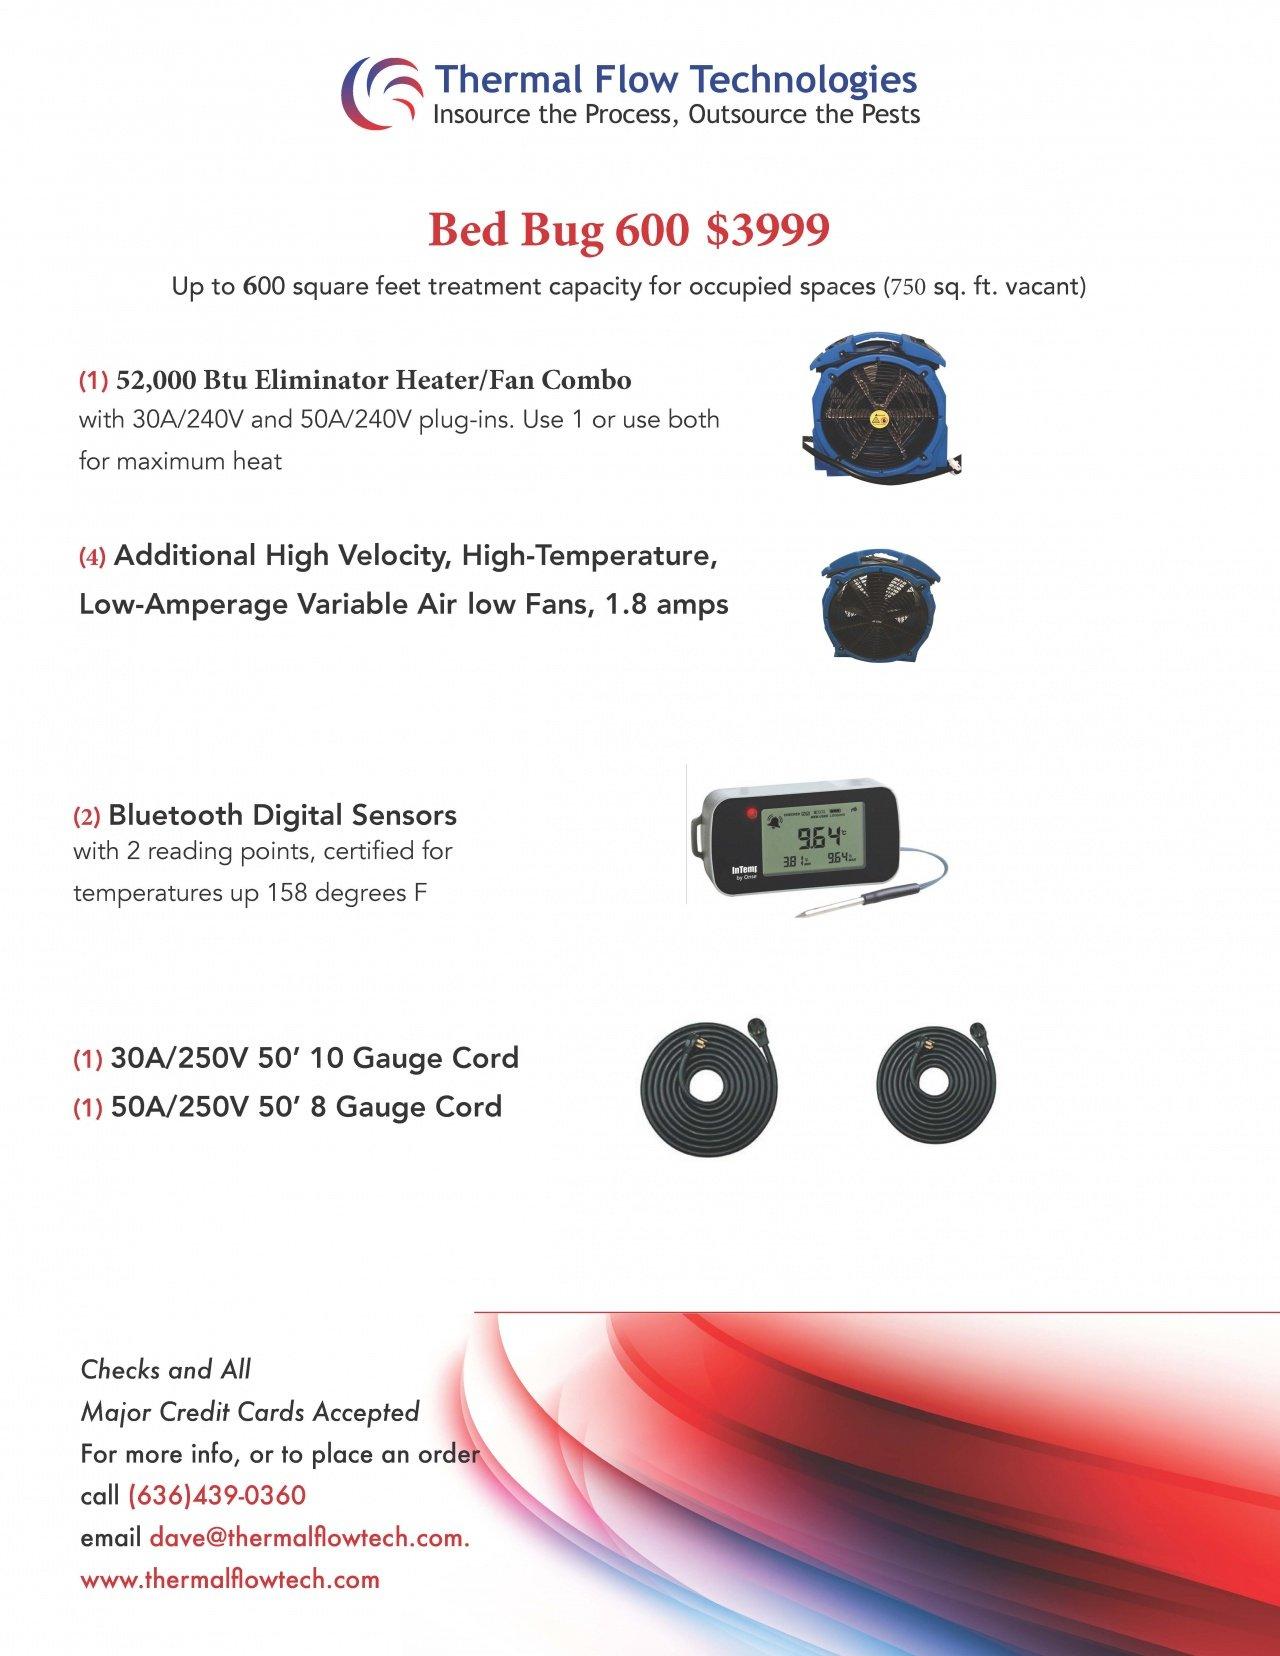 Großzügig 8 Gauge Ampere Rating Fotos - Schaltplan Serie Circuit ...